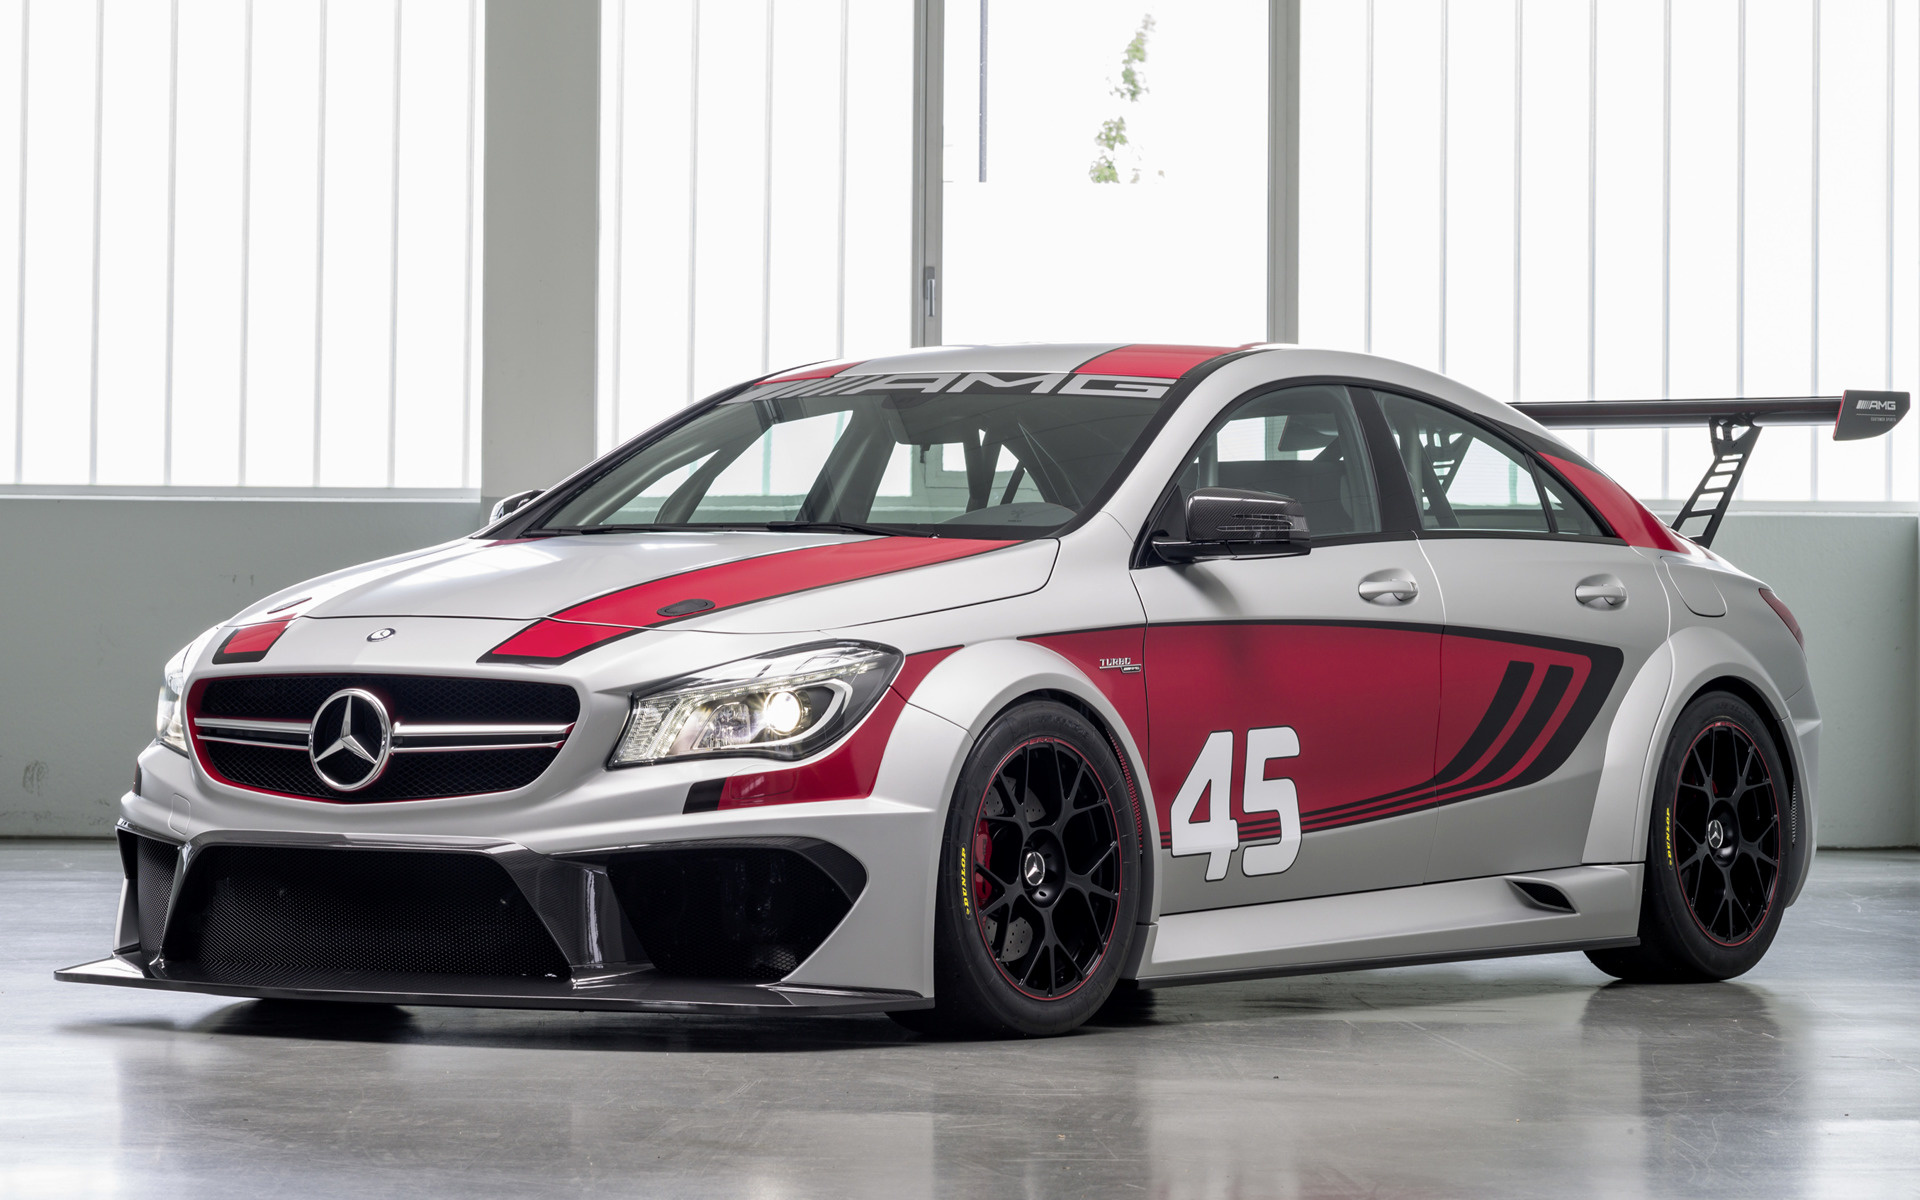 2013 Mercedes Benz Cla 45 Amg Racing Series Concept Fondos